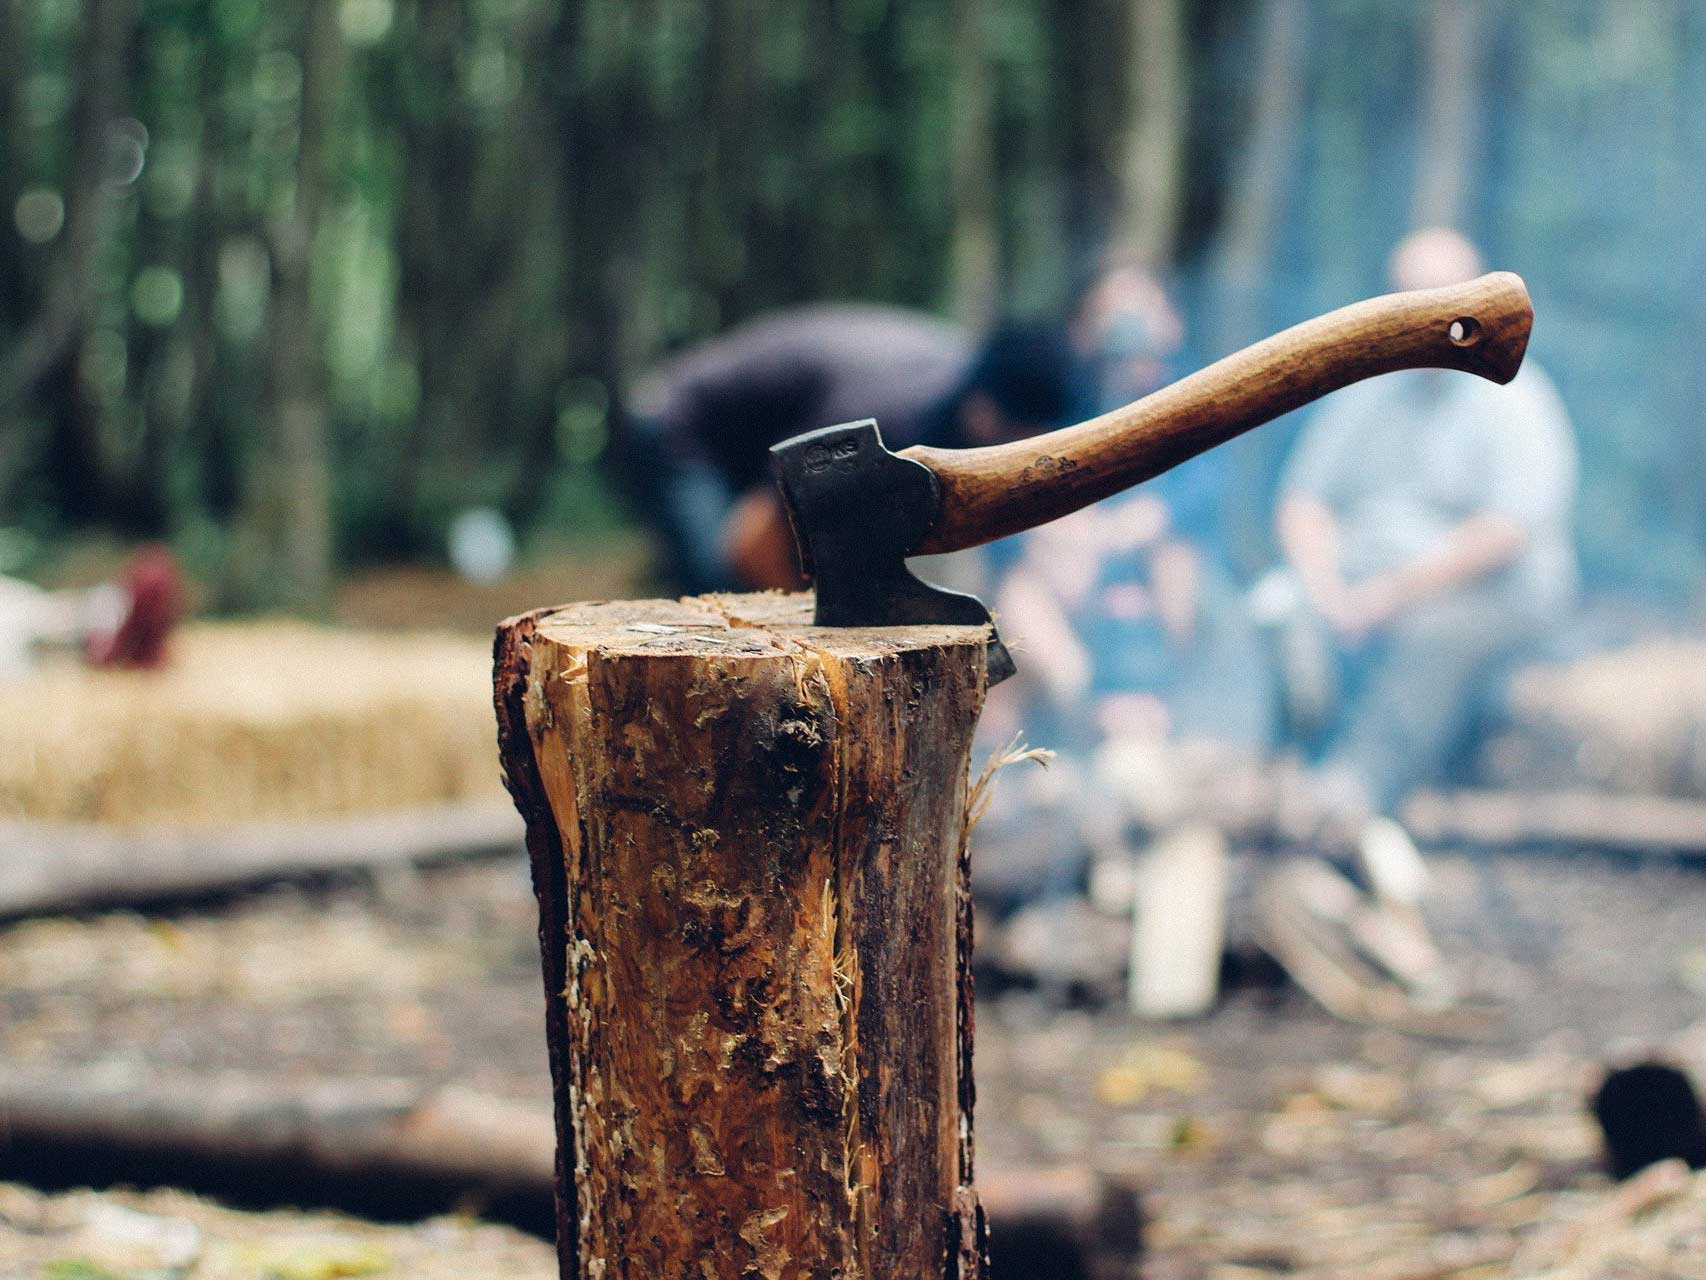 The best hatchet in a block of wood